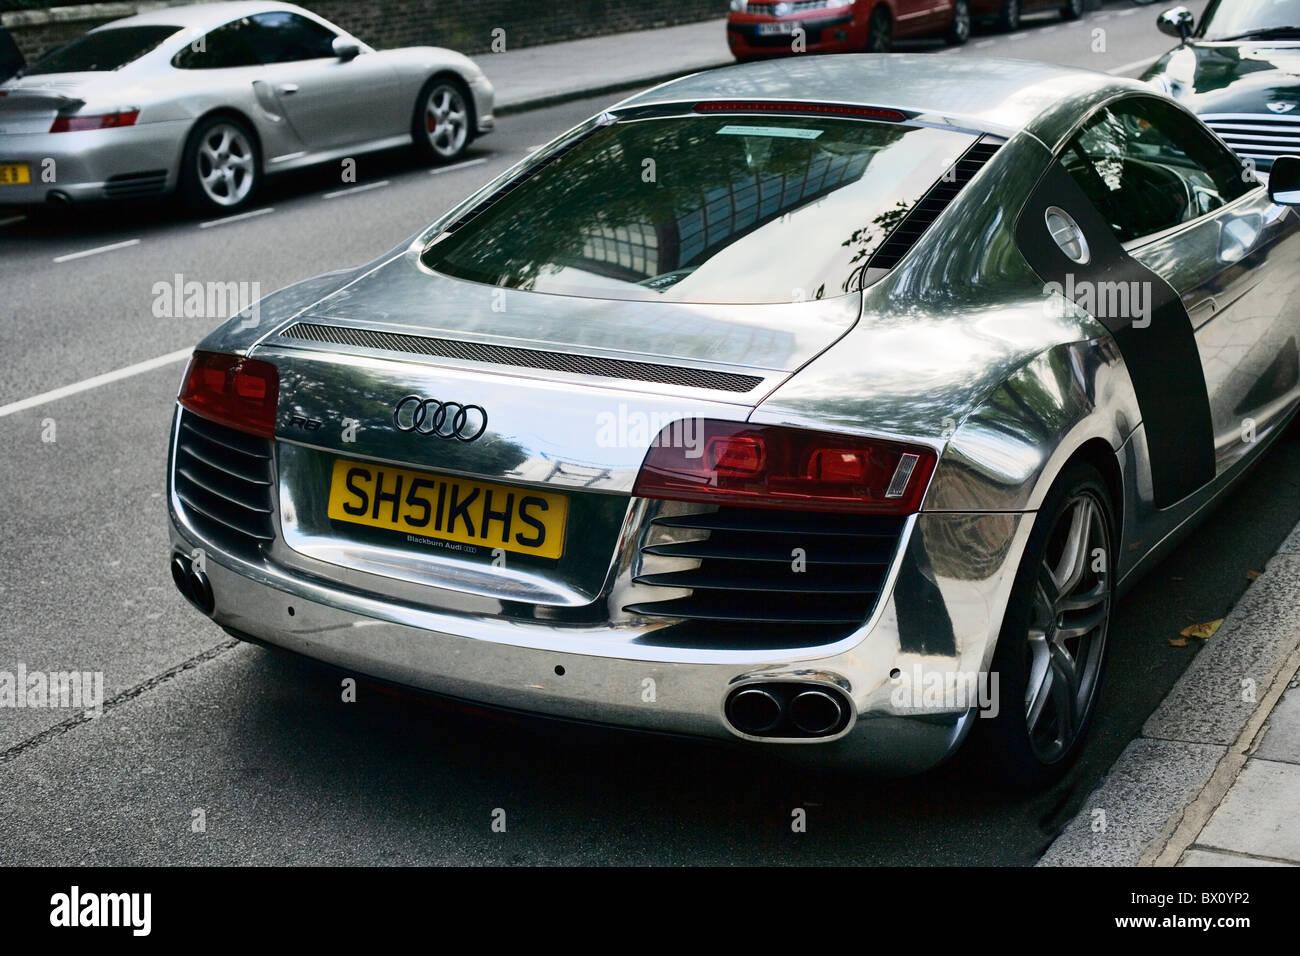 Audi R With Personalised Number Plates Paddington Street London - Audi car number